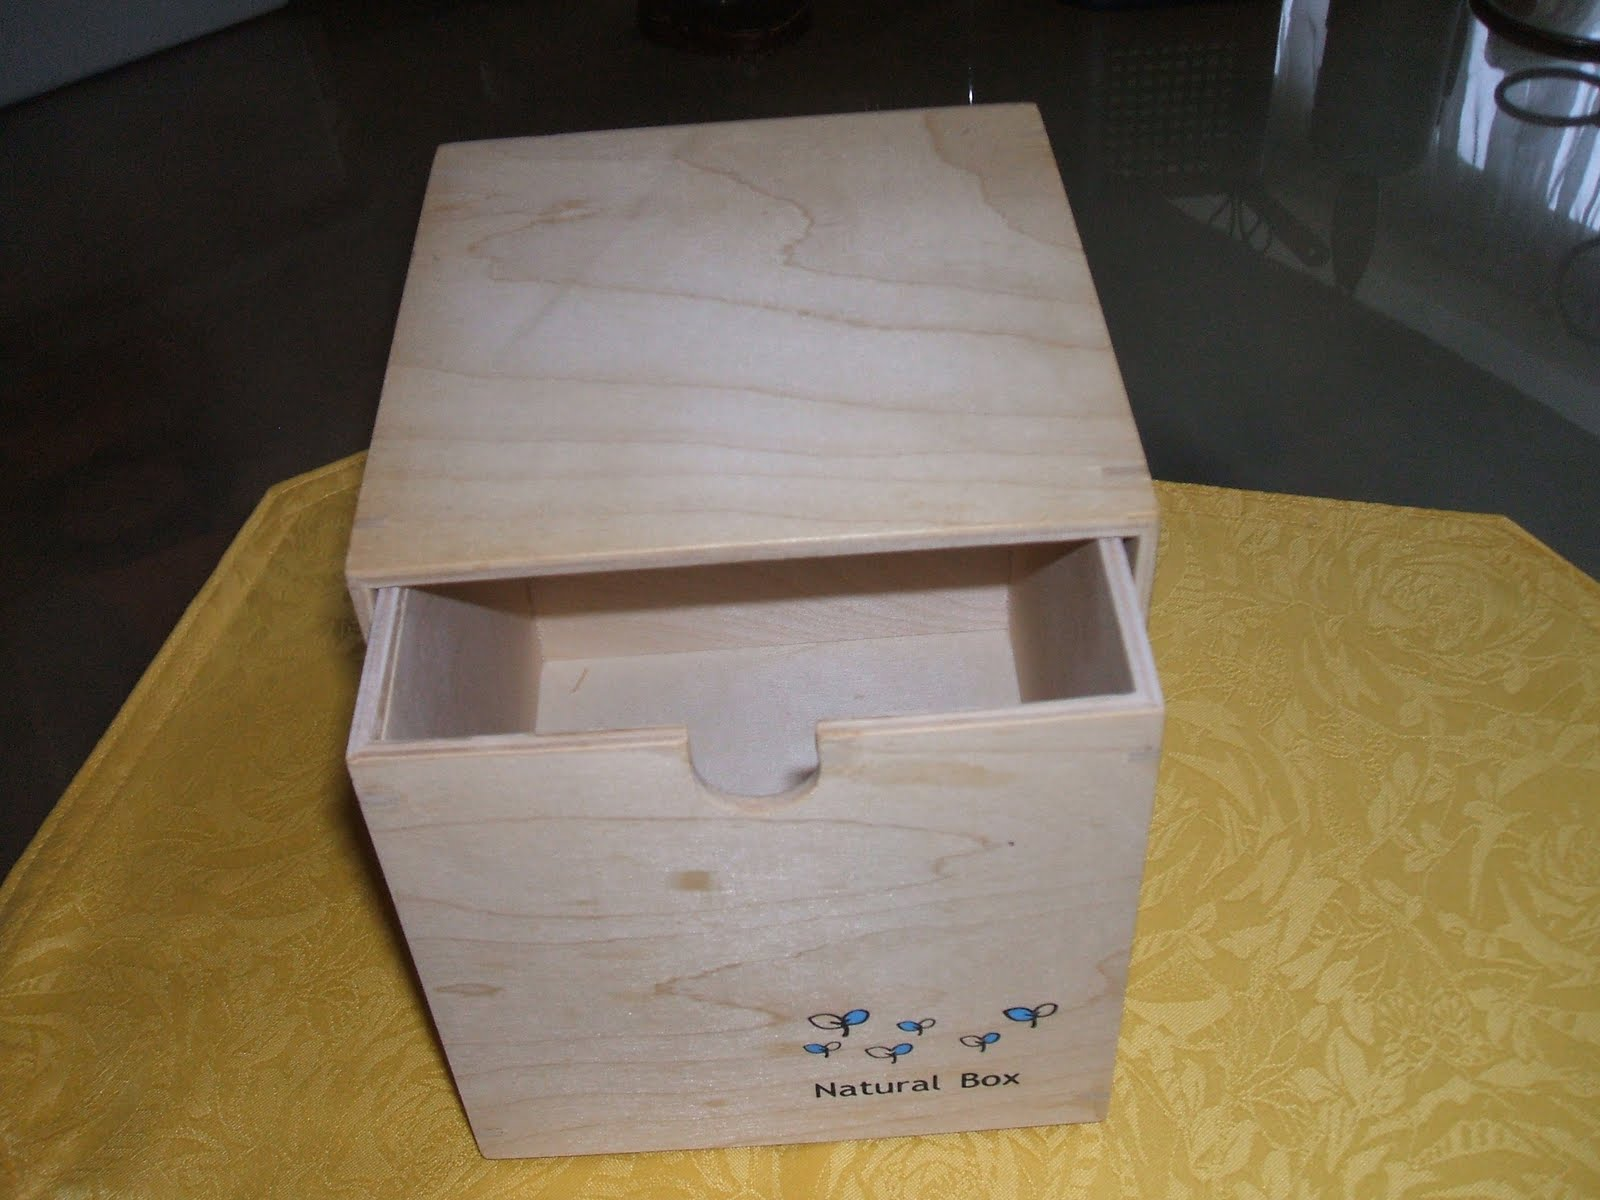 wir basteln washi papier bastelarbeiten mit verpackungsmaterial. Black Bedroom Furniture Sets. Home Design Ideas